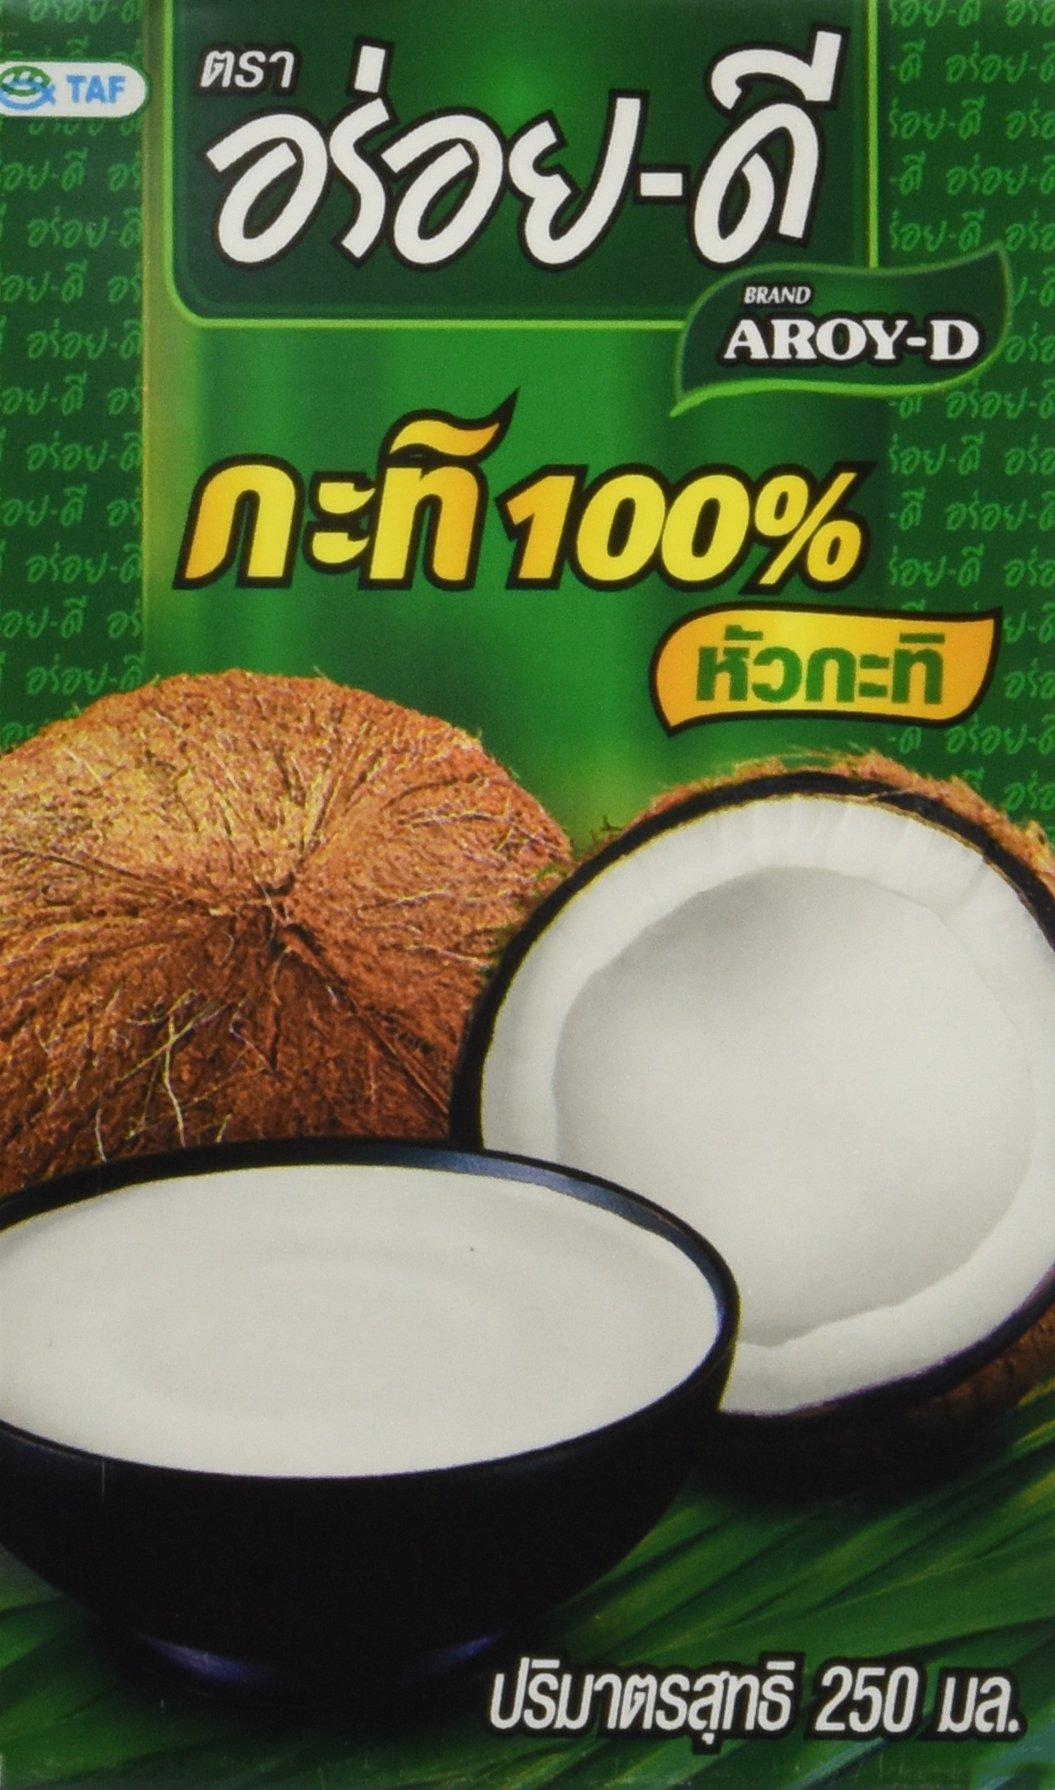 100% Coconut Milk - 8.5 Oz Packages (18-pack)